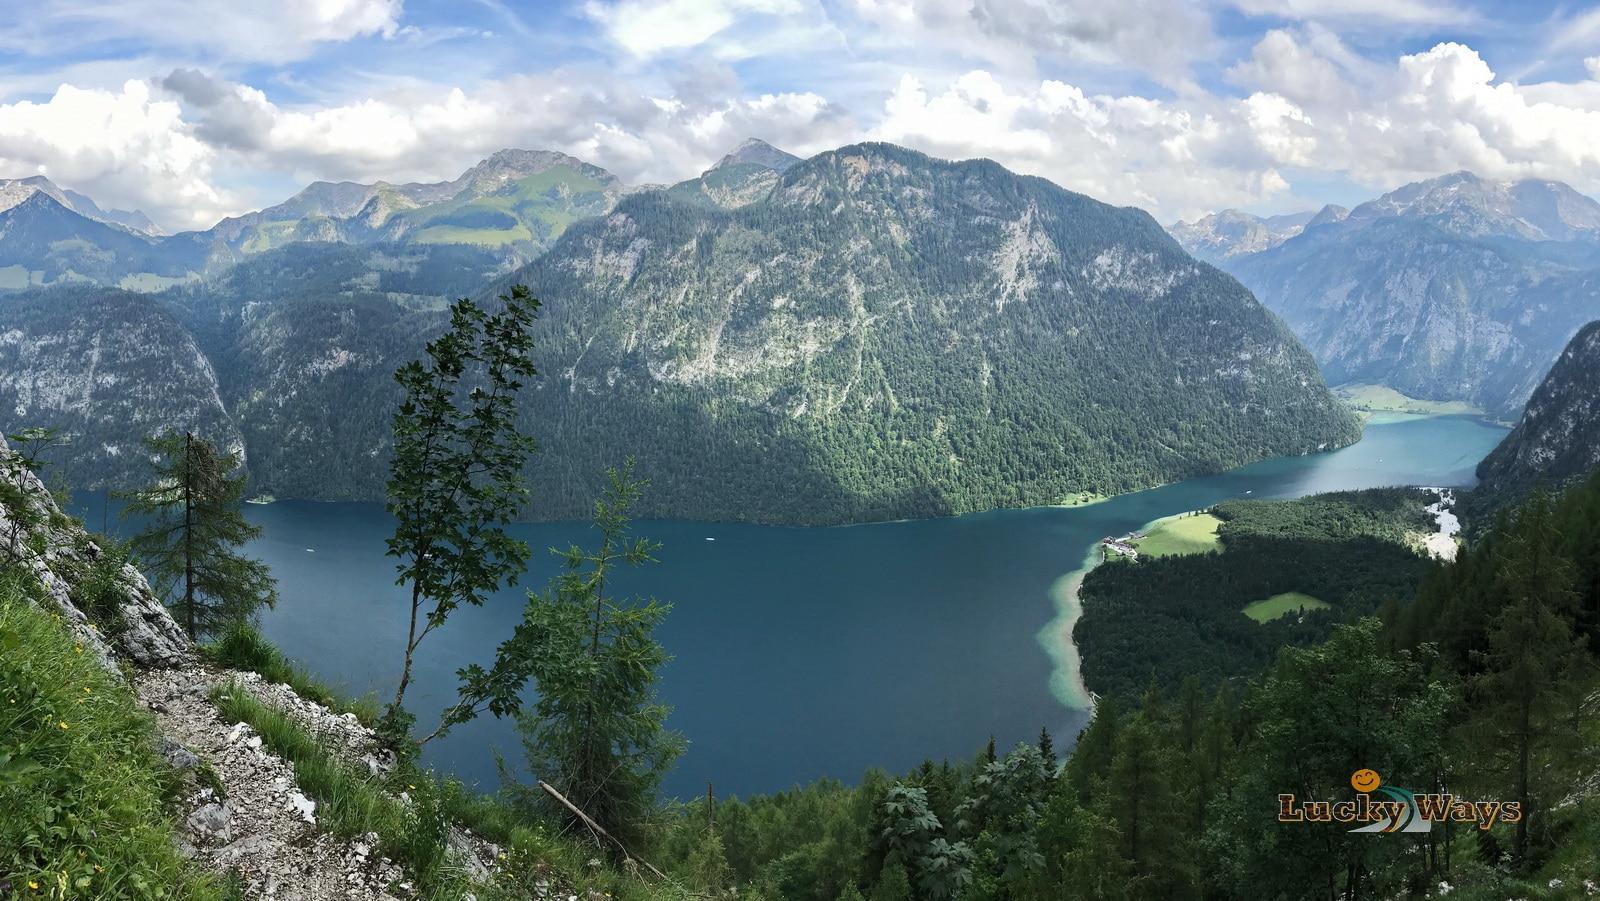 Nationalpark Berchtesgaden Bayern Königssee Rinnkendlsteig